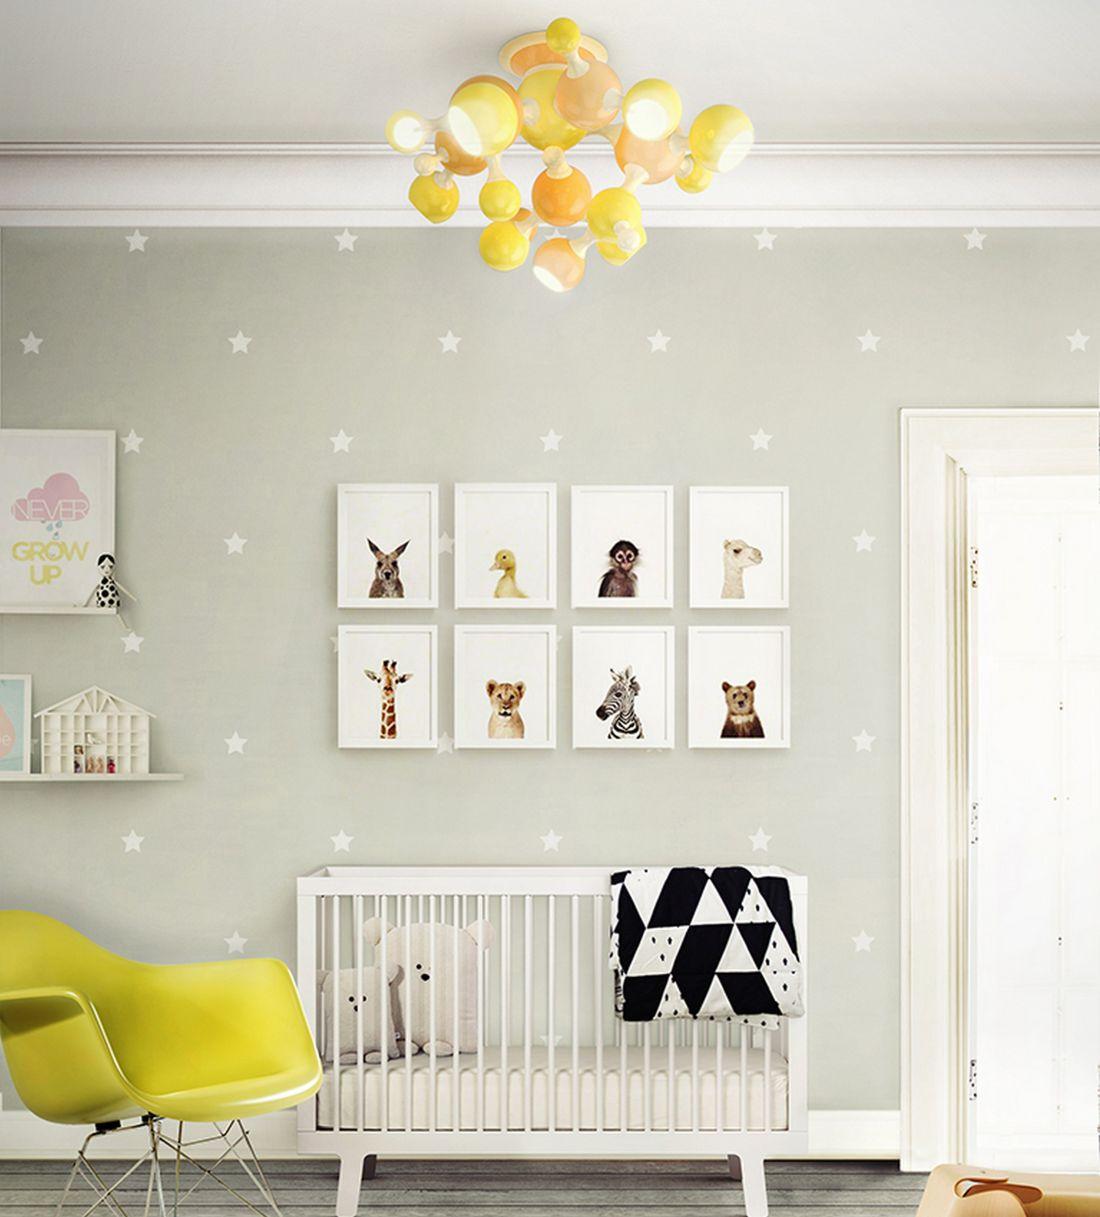 nursery-inspiration-with-atomic-yellow-chandelier.jpg